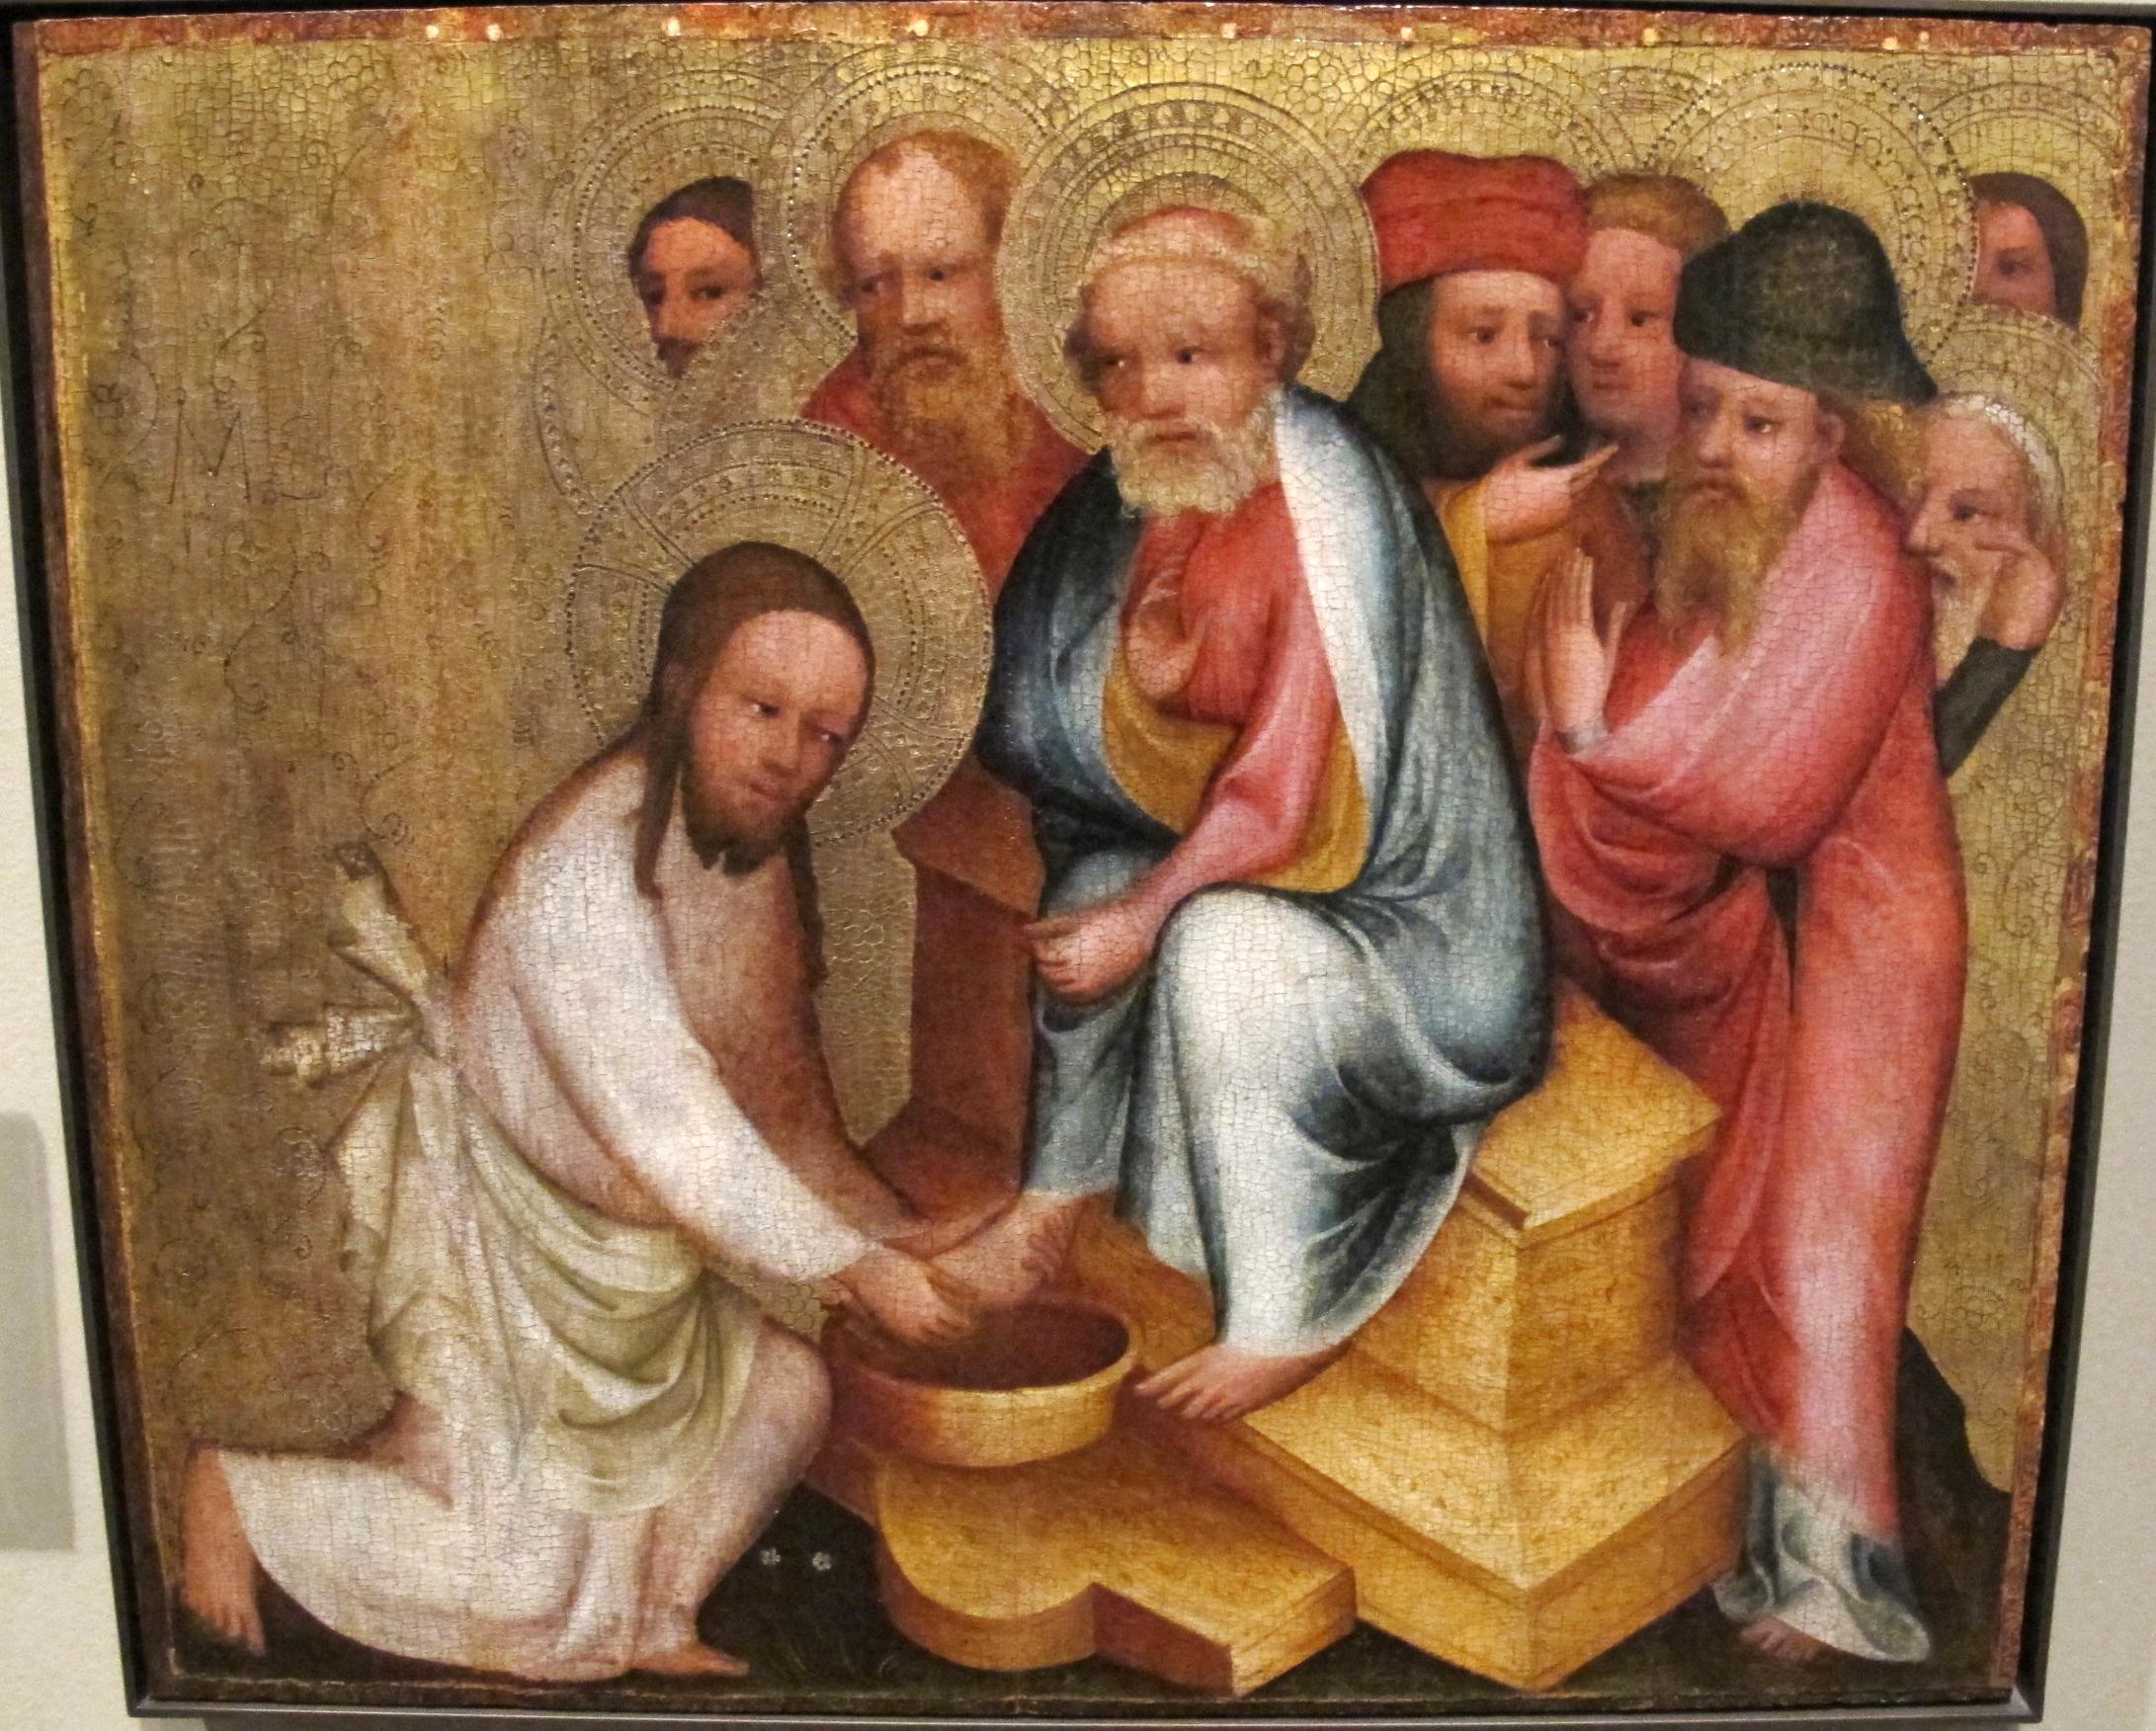 Maestro bertram di minden, lavanda dei piedi, Amburgo dans immagini sacre